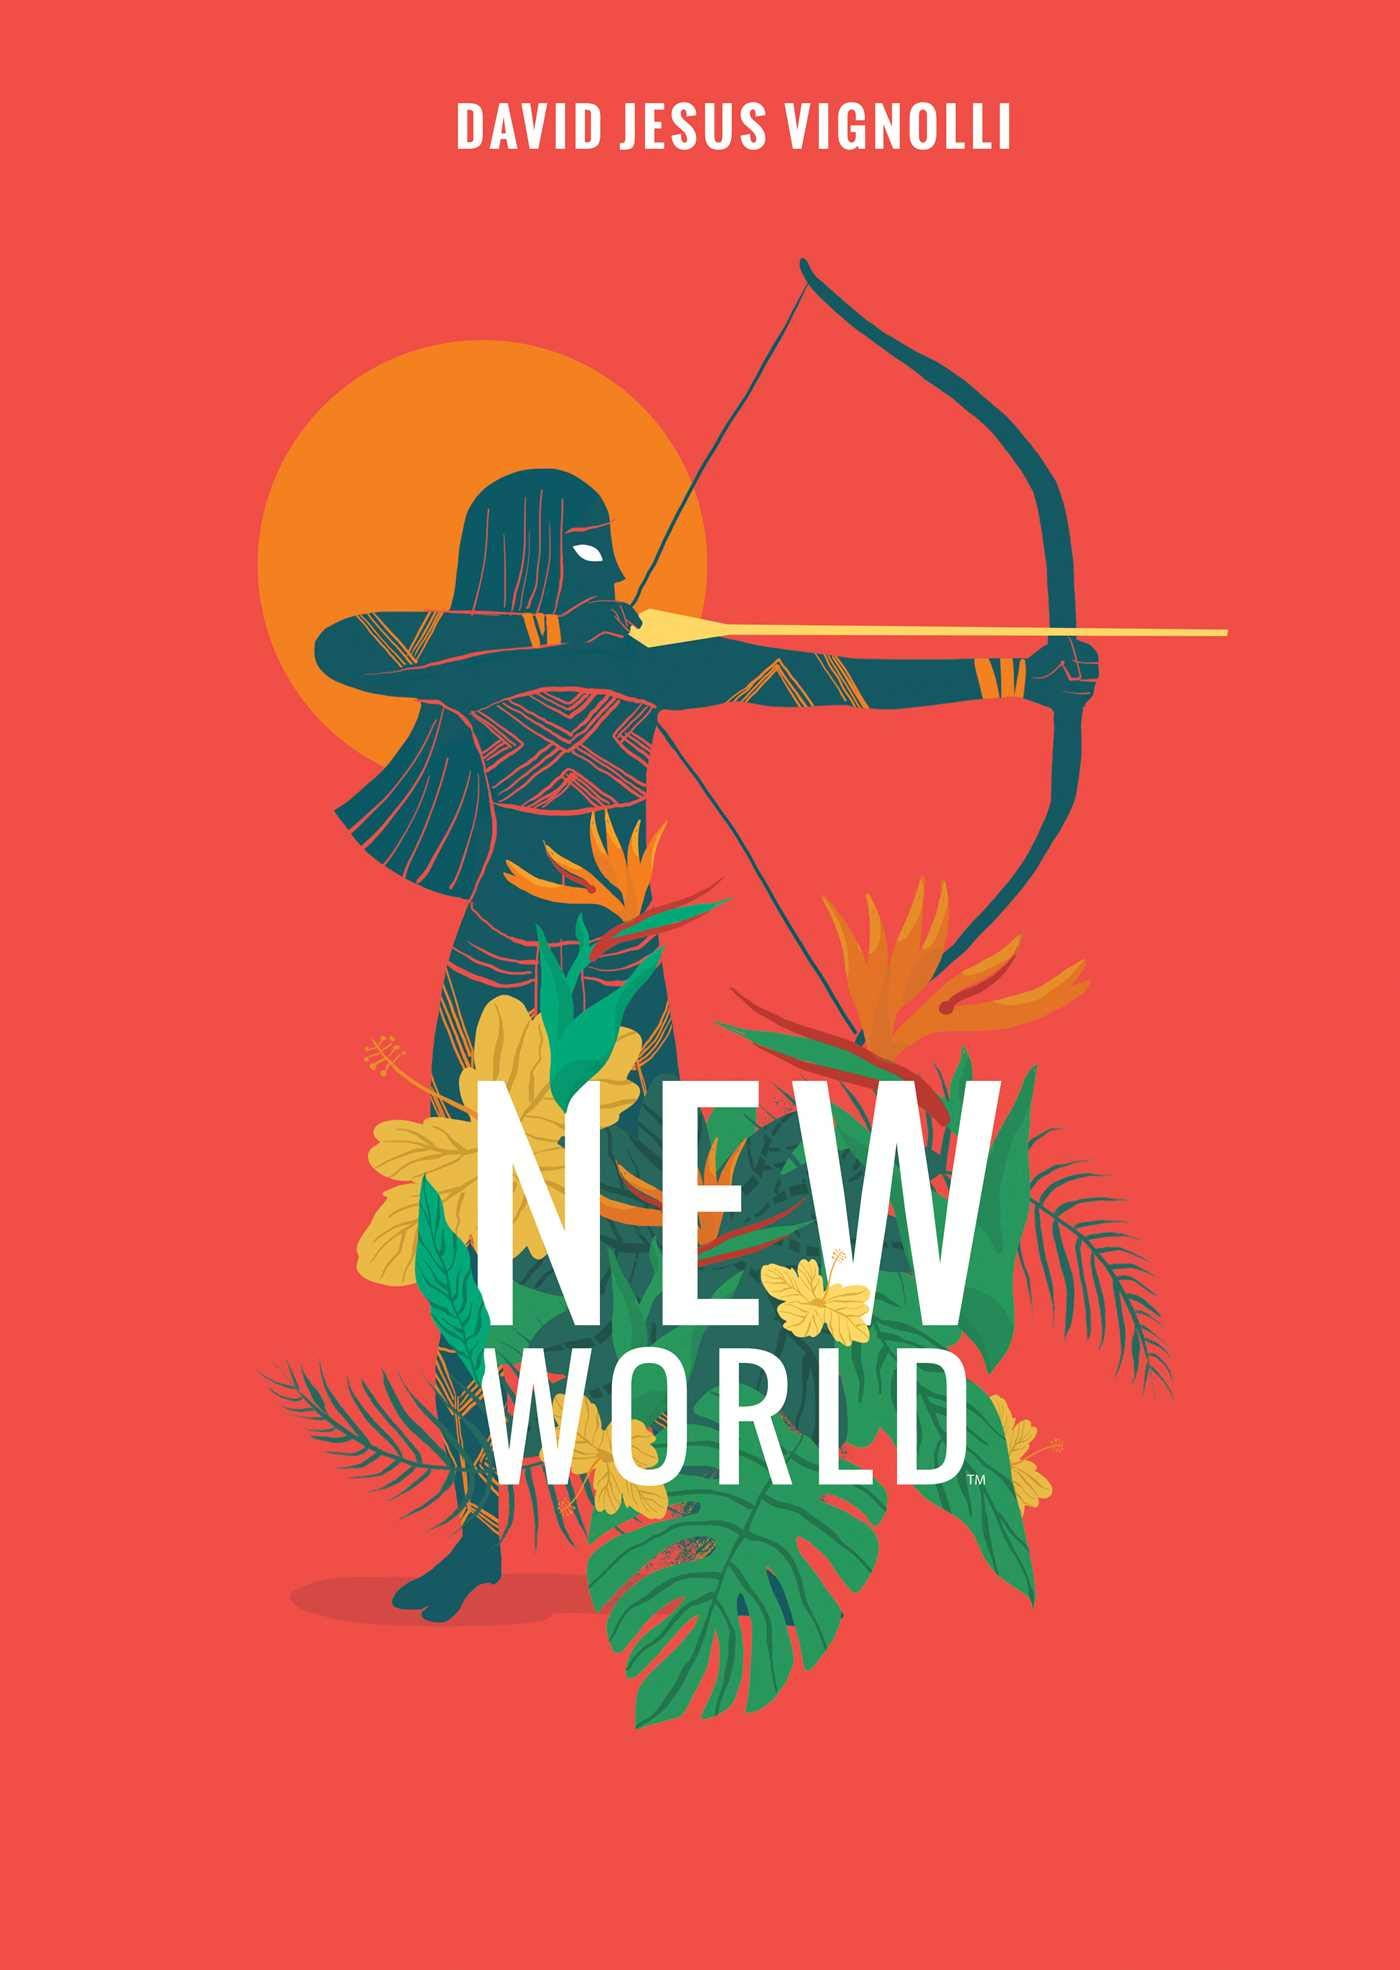 Image result for new world david jesus